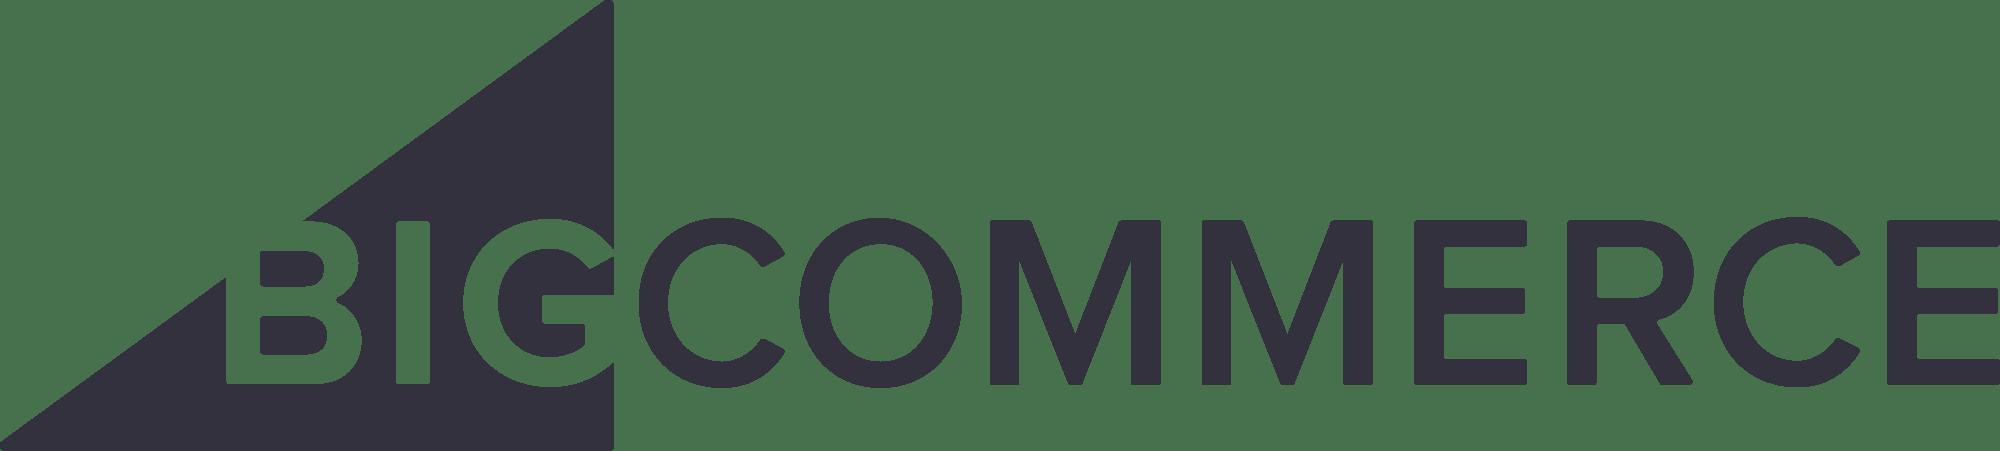 Miva to Bigcommerce Migration